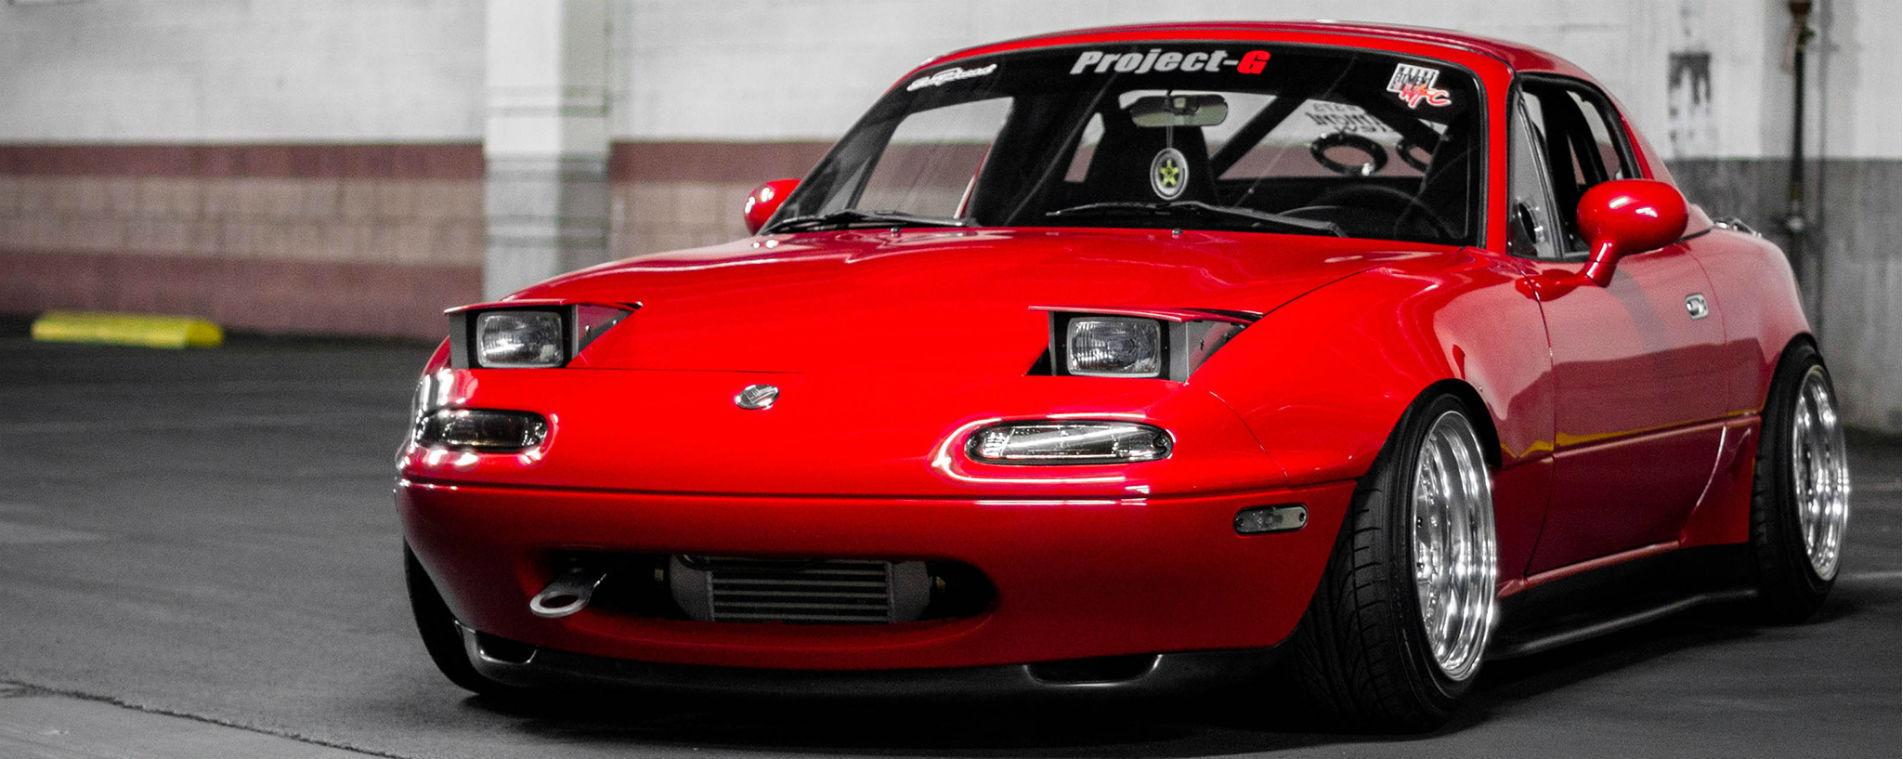 Low Pro Miata Headlights Which Low Profile Headlights